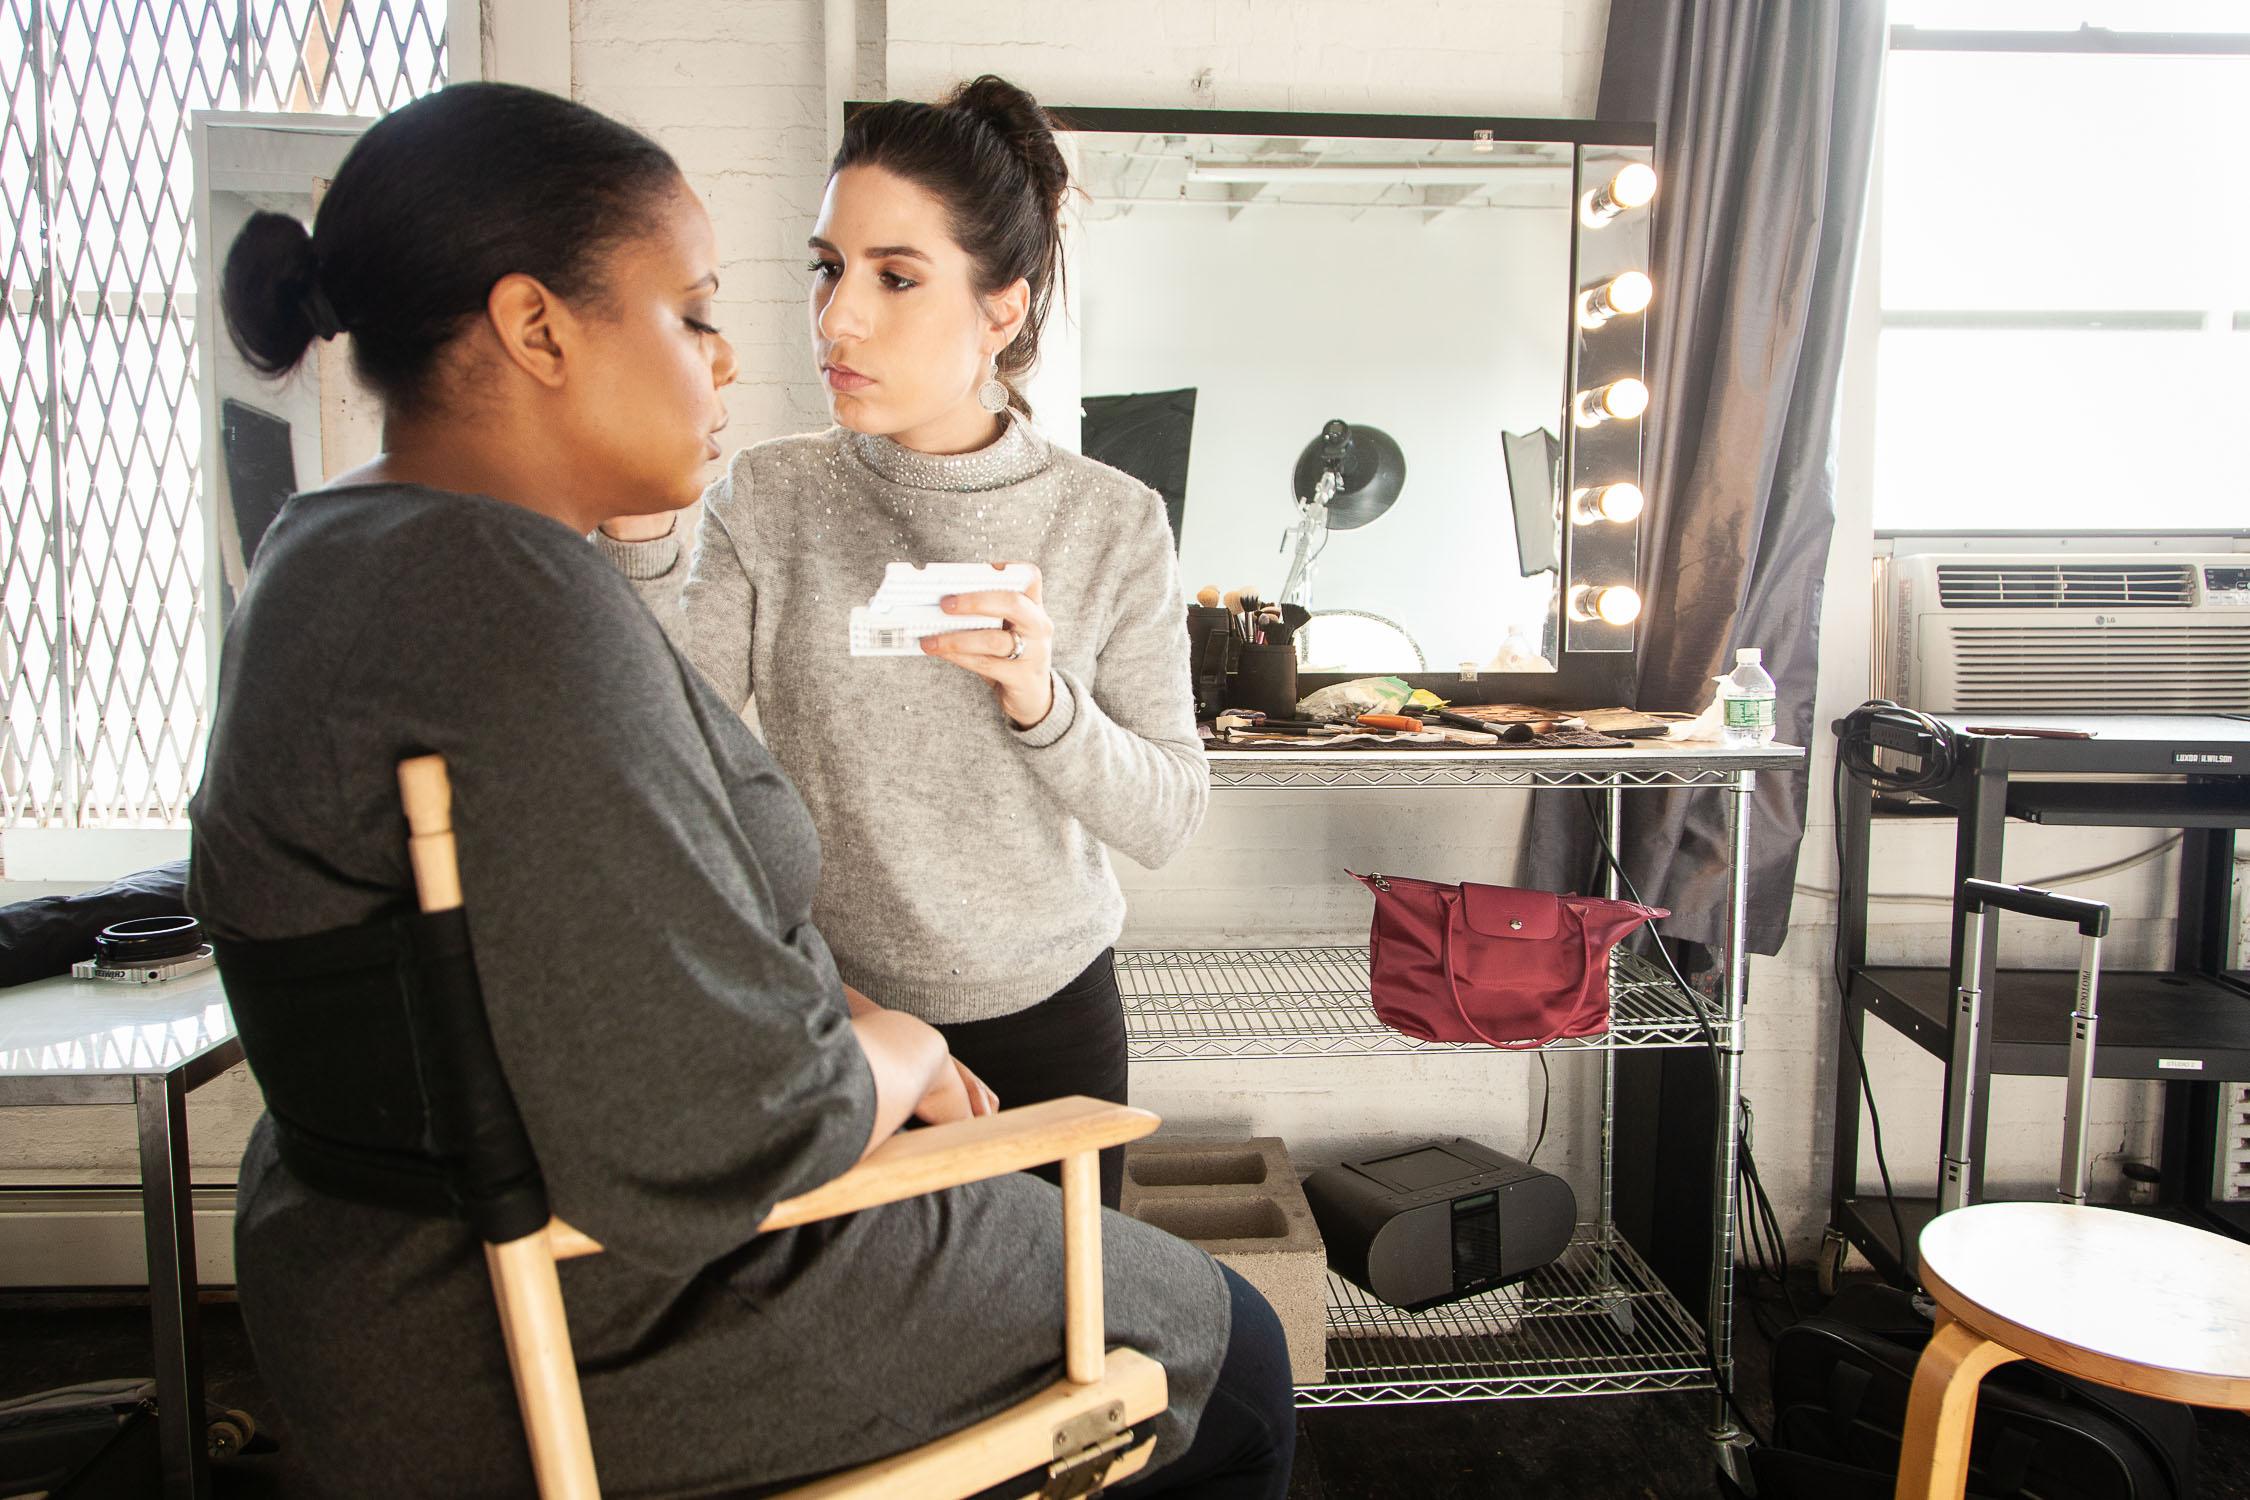 One of my top headshot makeup artists, Jennifer Margaret, applying makeup to a recent client.